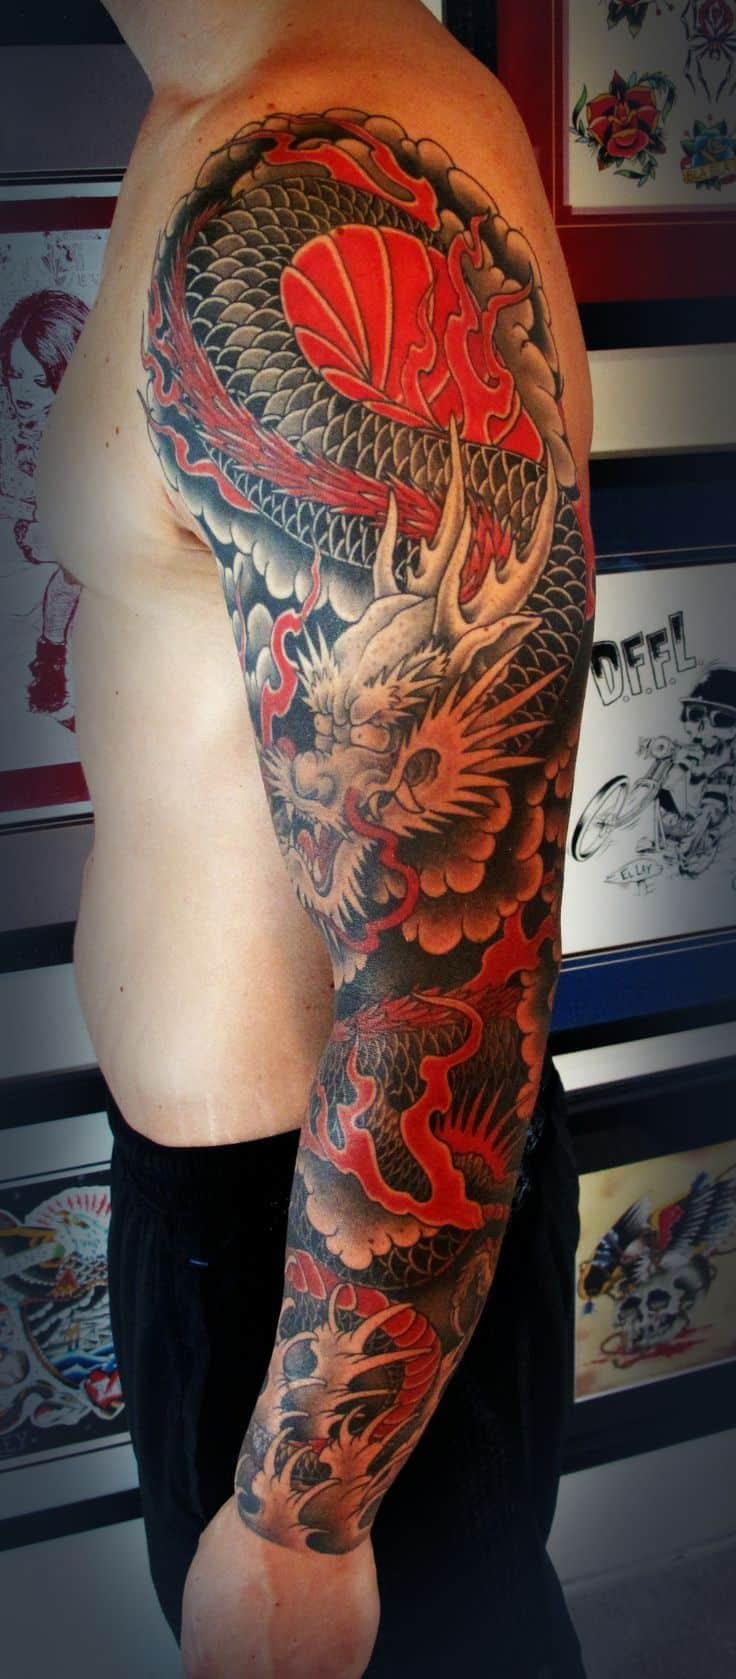 47 sleeve tattoos for men design ideas for guys for 1 4 sleeve tattoo